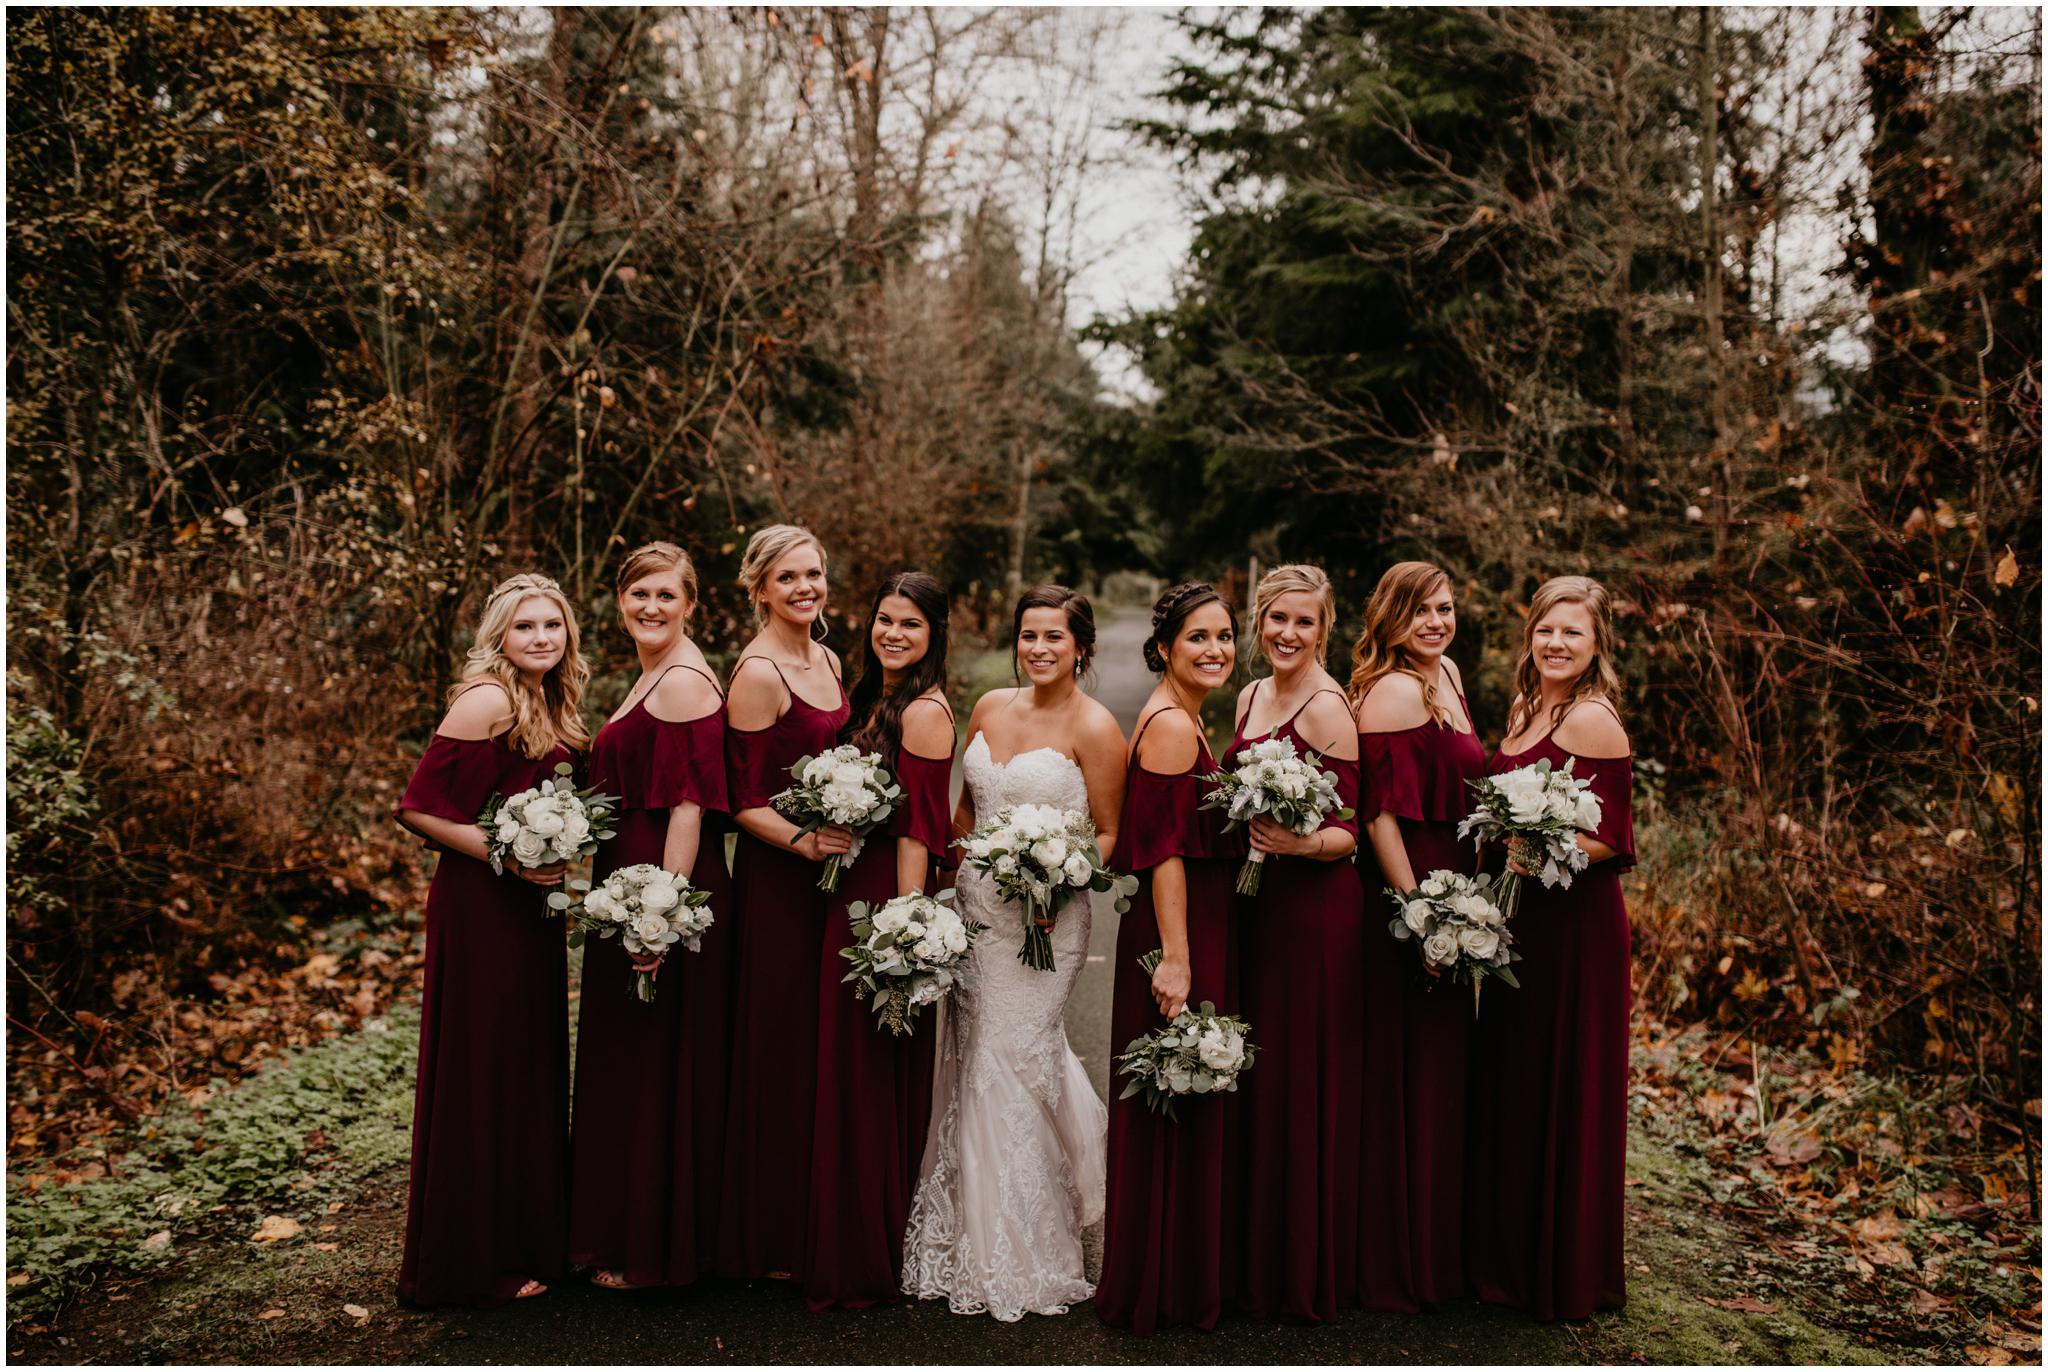 ashley-tj-the-pickering-barn-winter-wedding-seattle-photographer-034.jpg